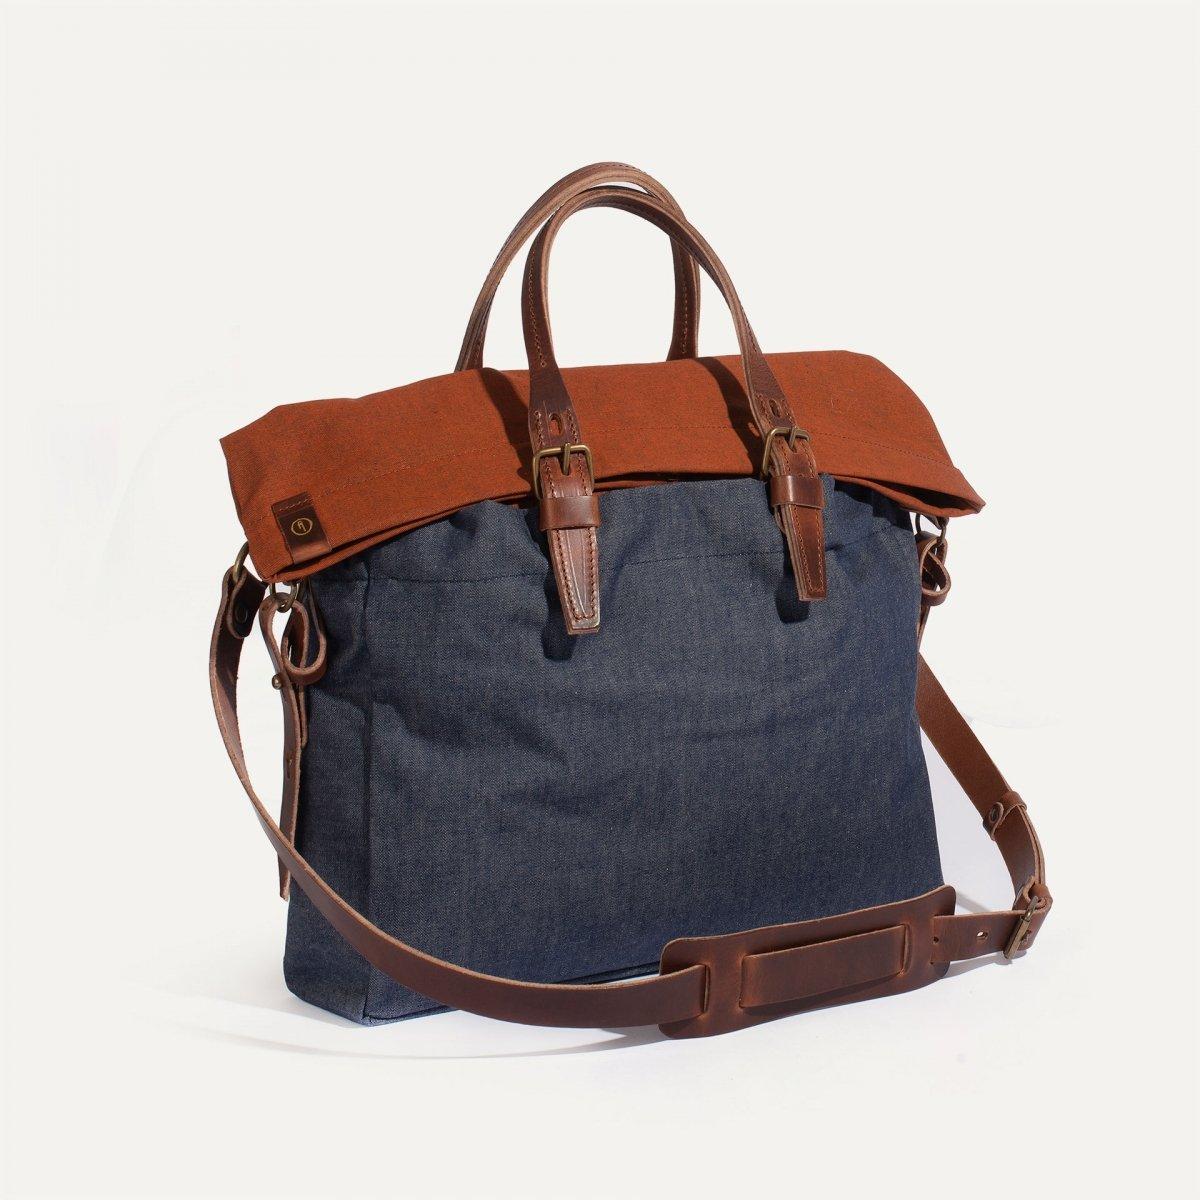 Remix business bag - Denim/Terra cotta (image n°2)